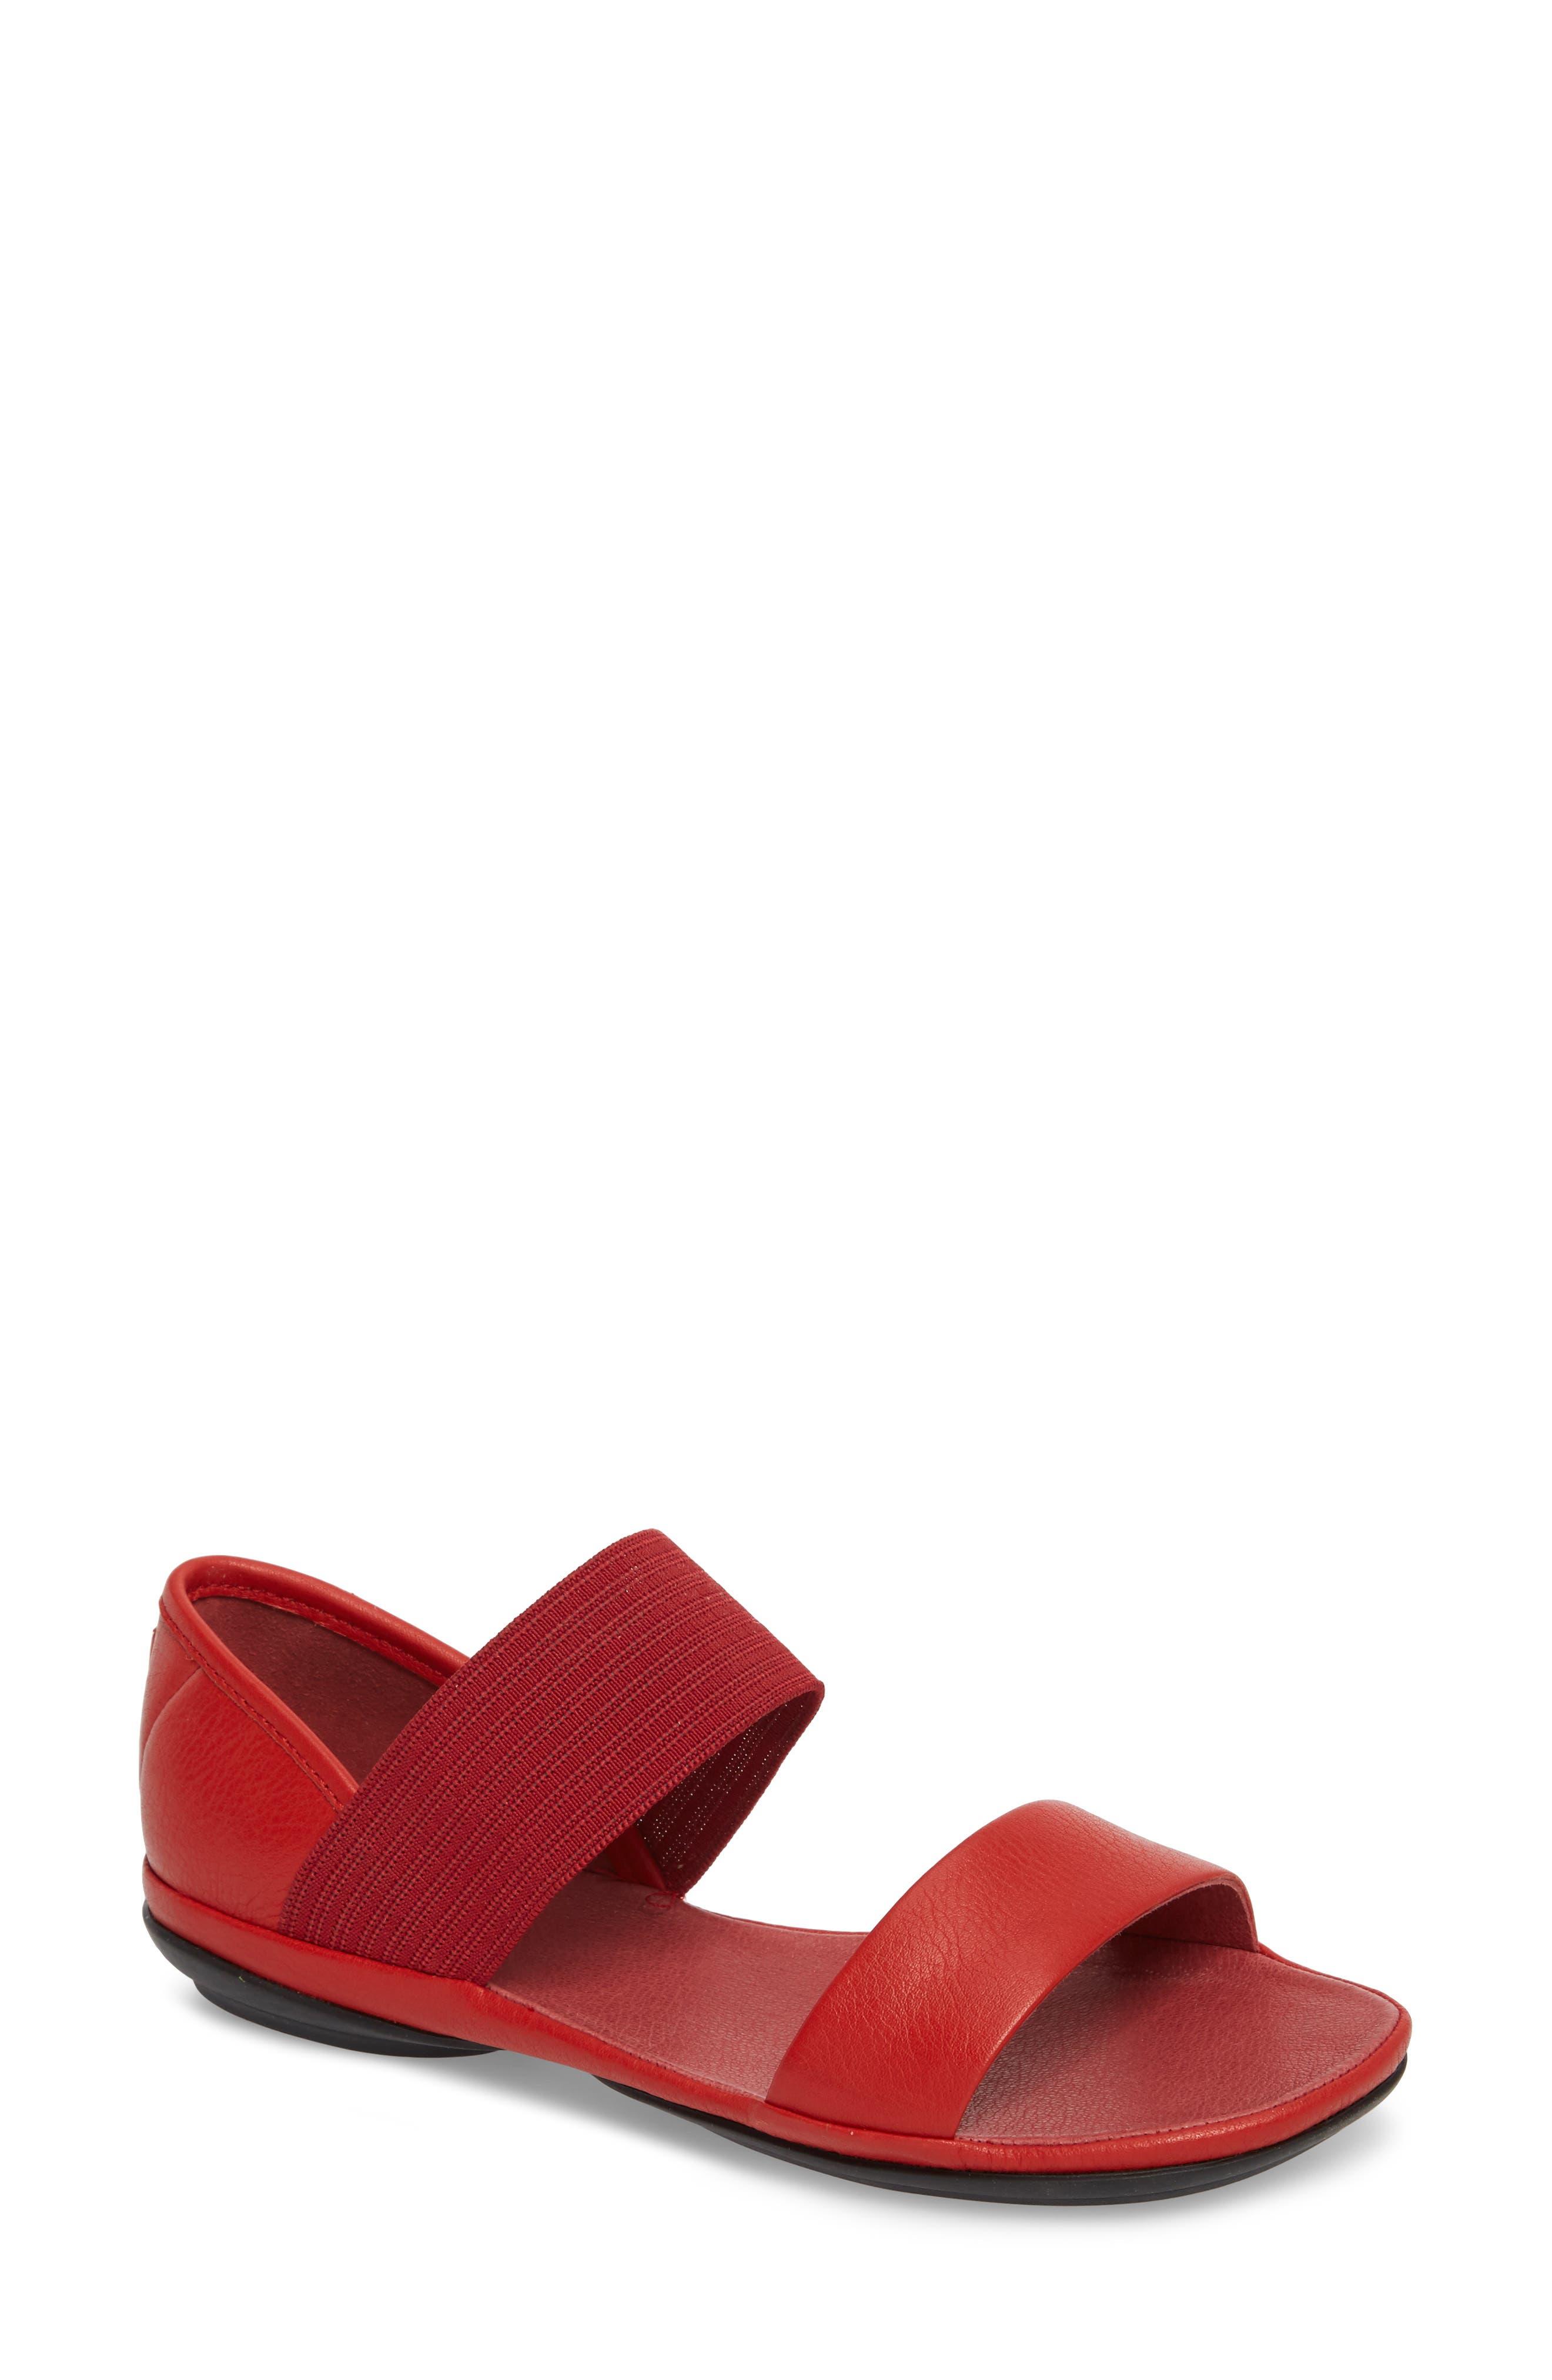 Right Nina Sandal,                         Main,                         color, Medium Red Leather